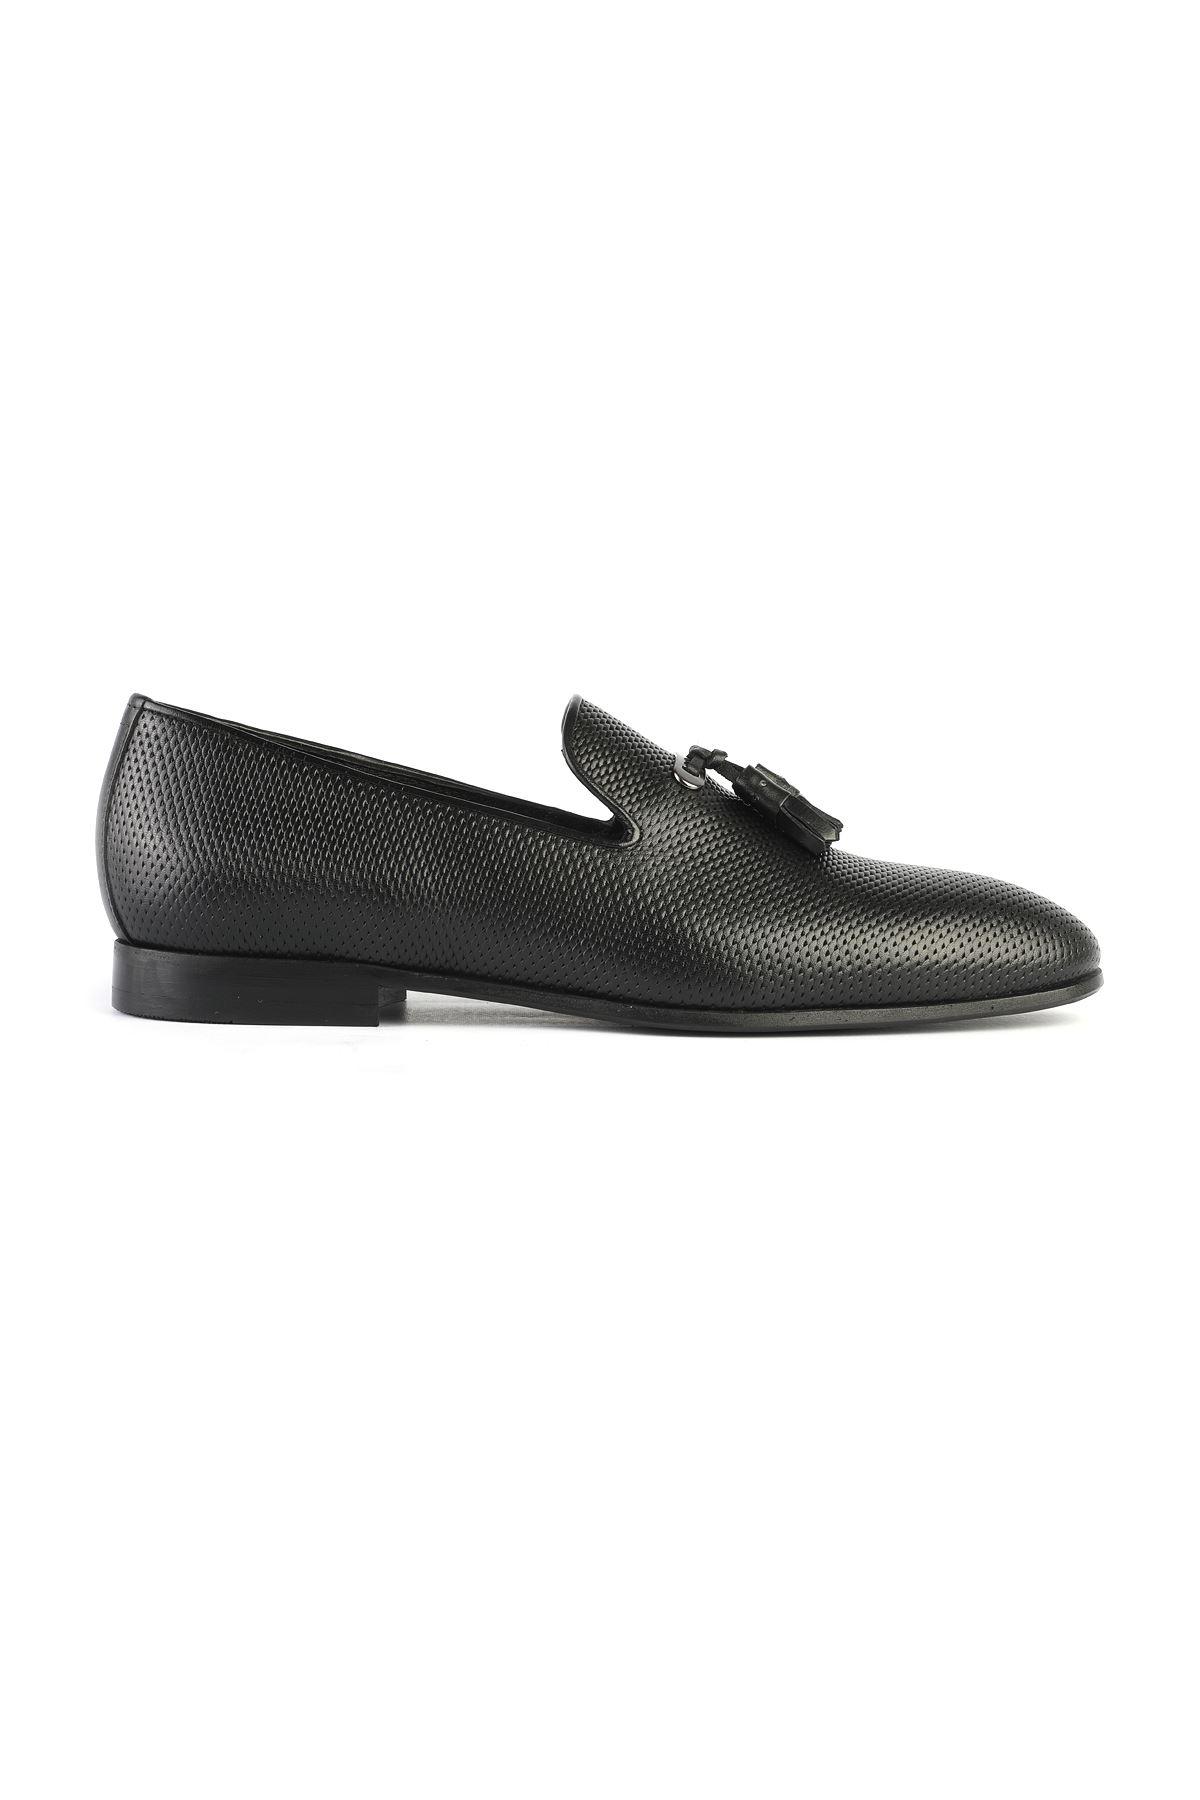 Libero 3324 Black Loafer Shoes